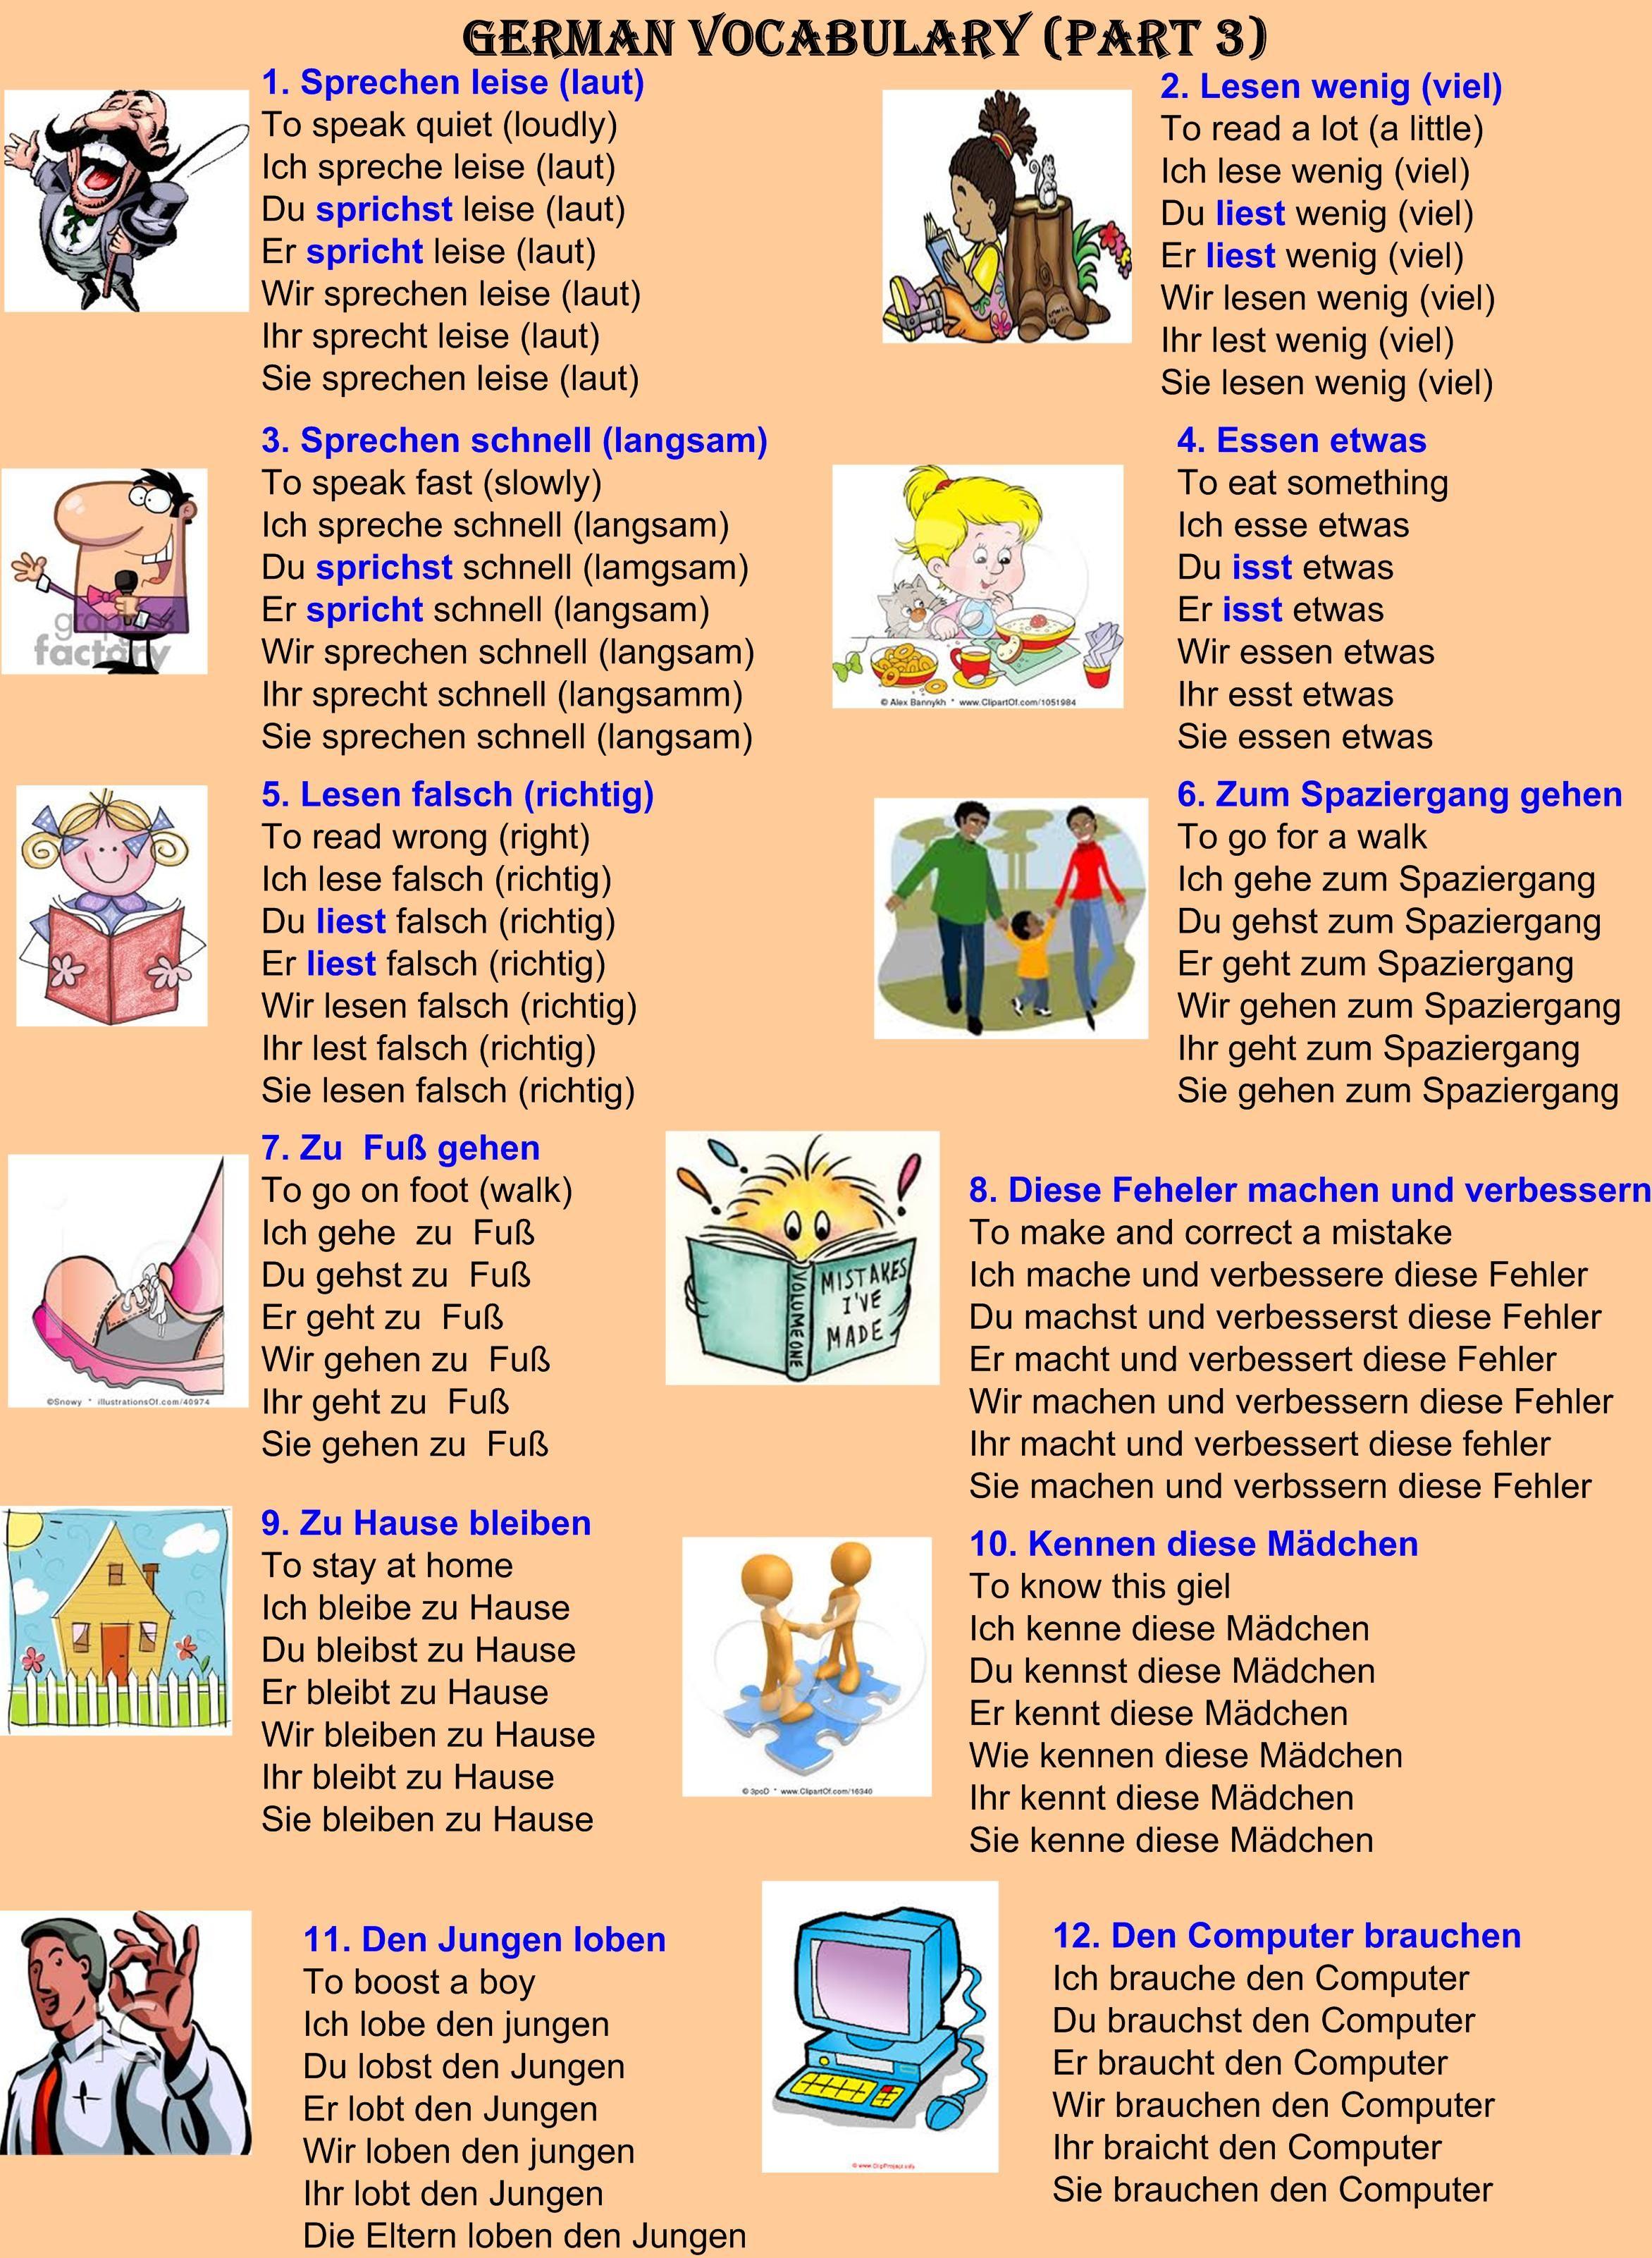 German Vocabulary Part 3